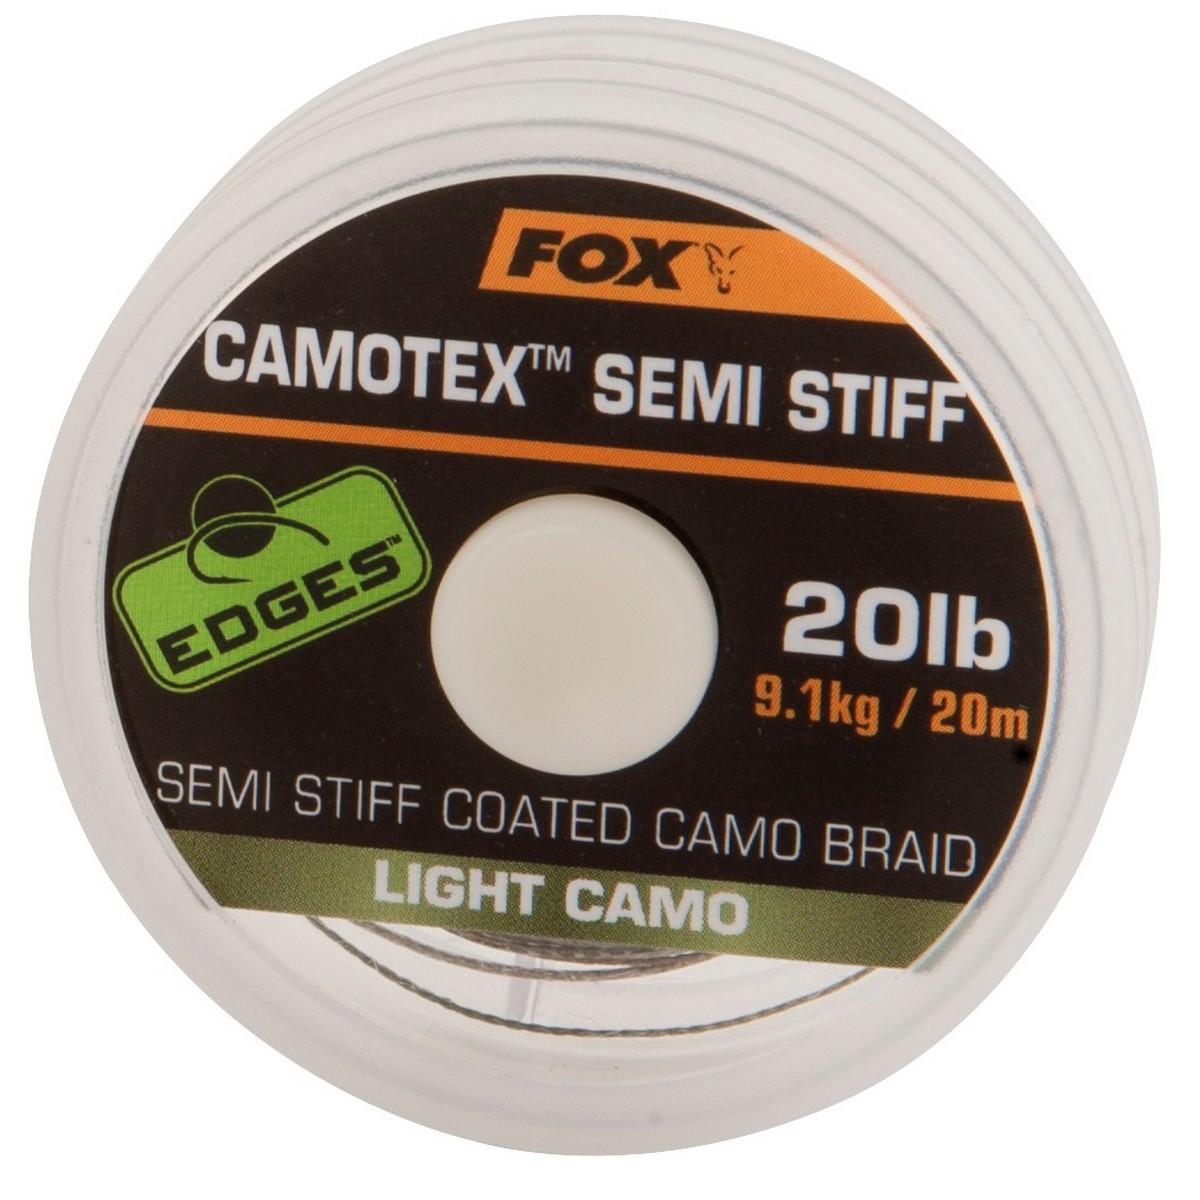 Риболовно влакно Fox Edges Camotex Semi Stiff Light Camo 20m